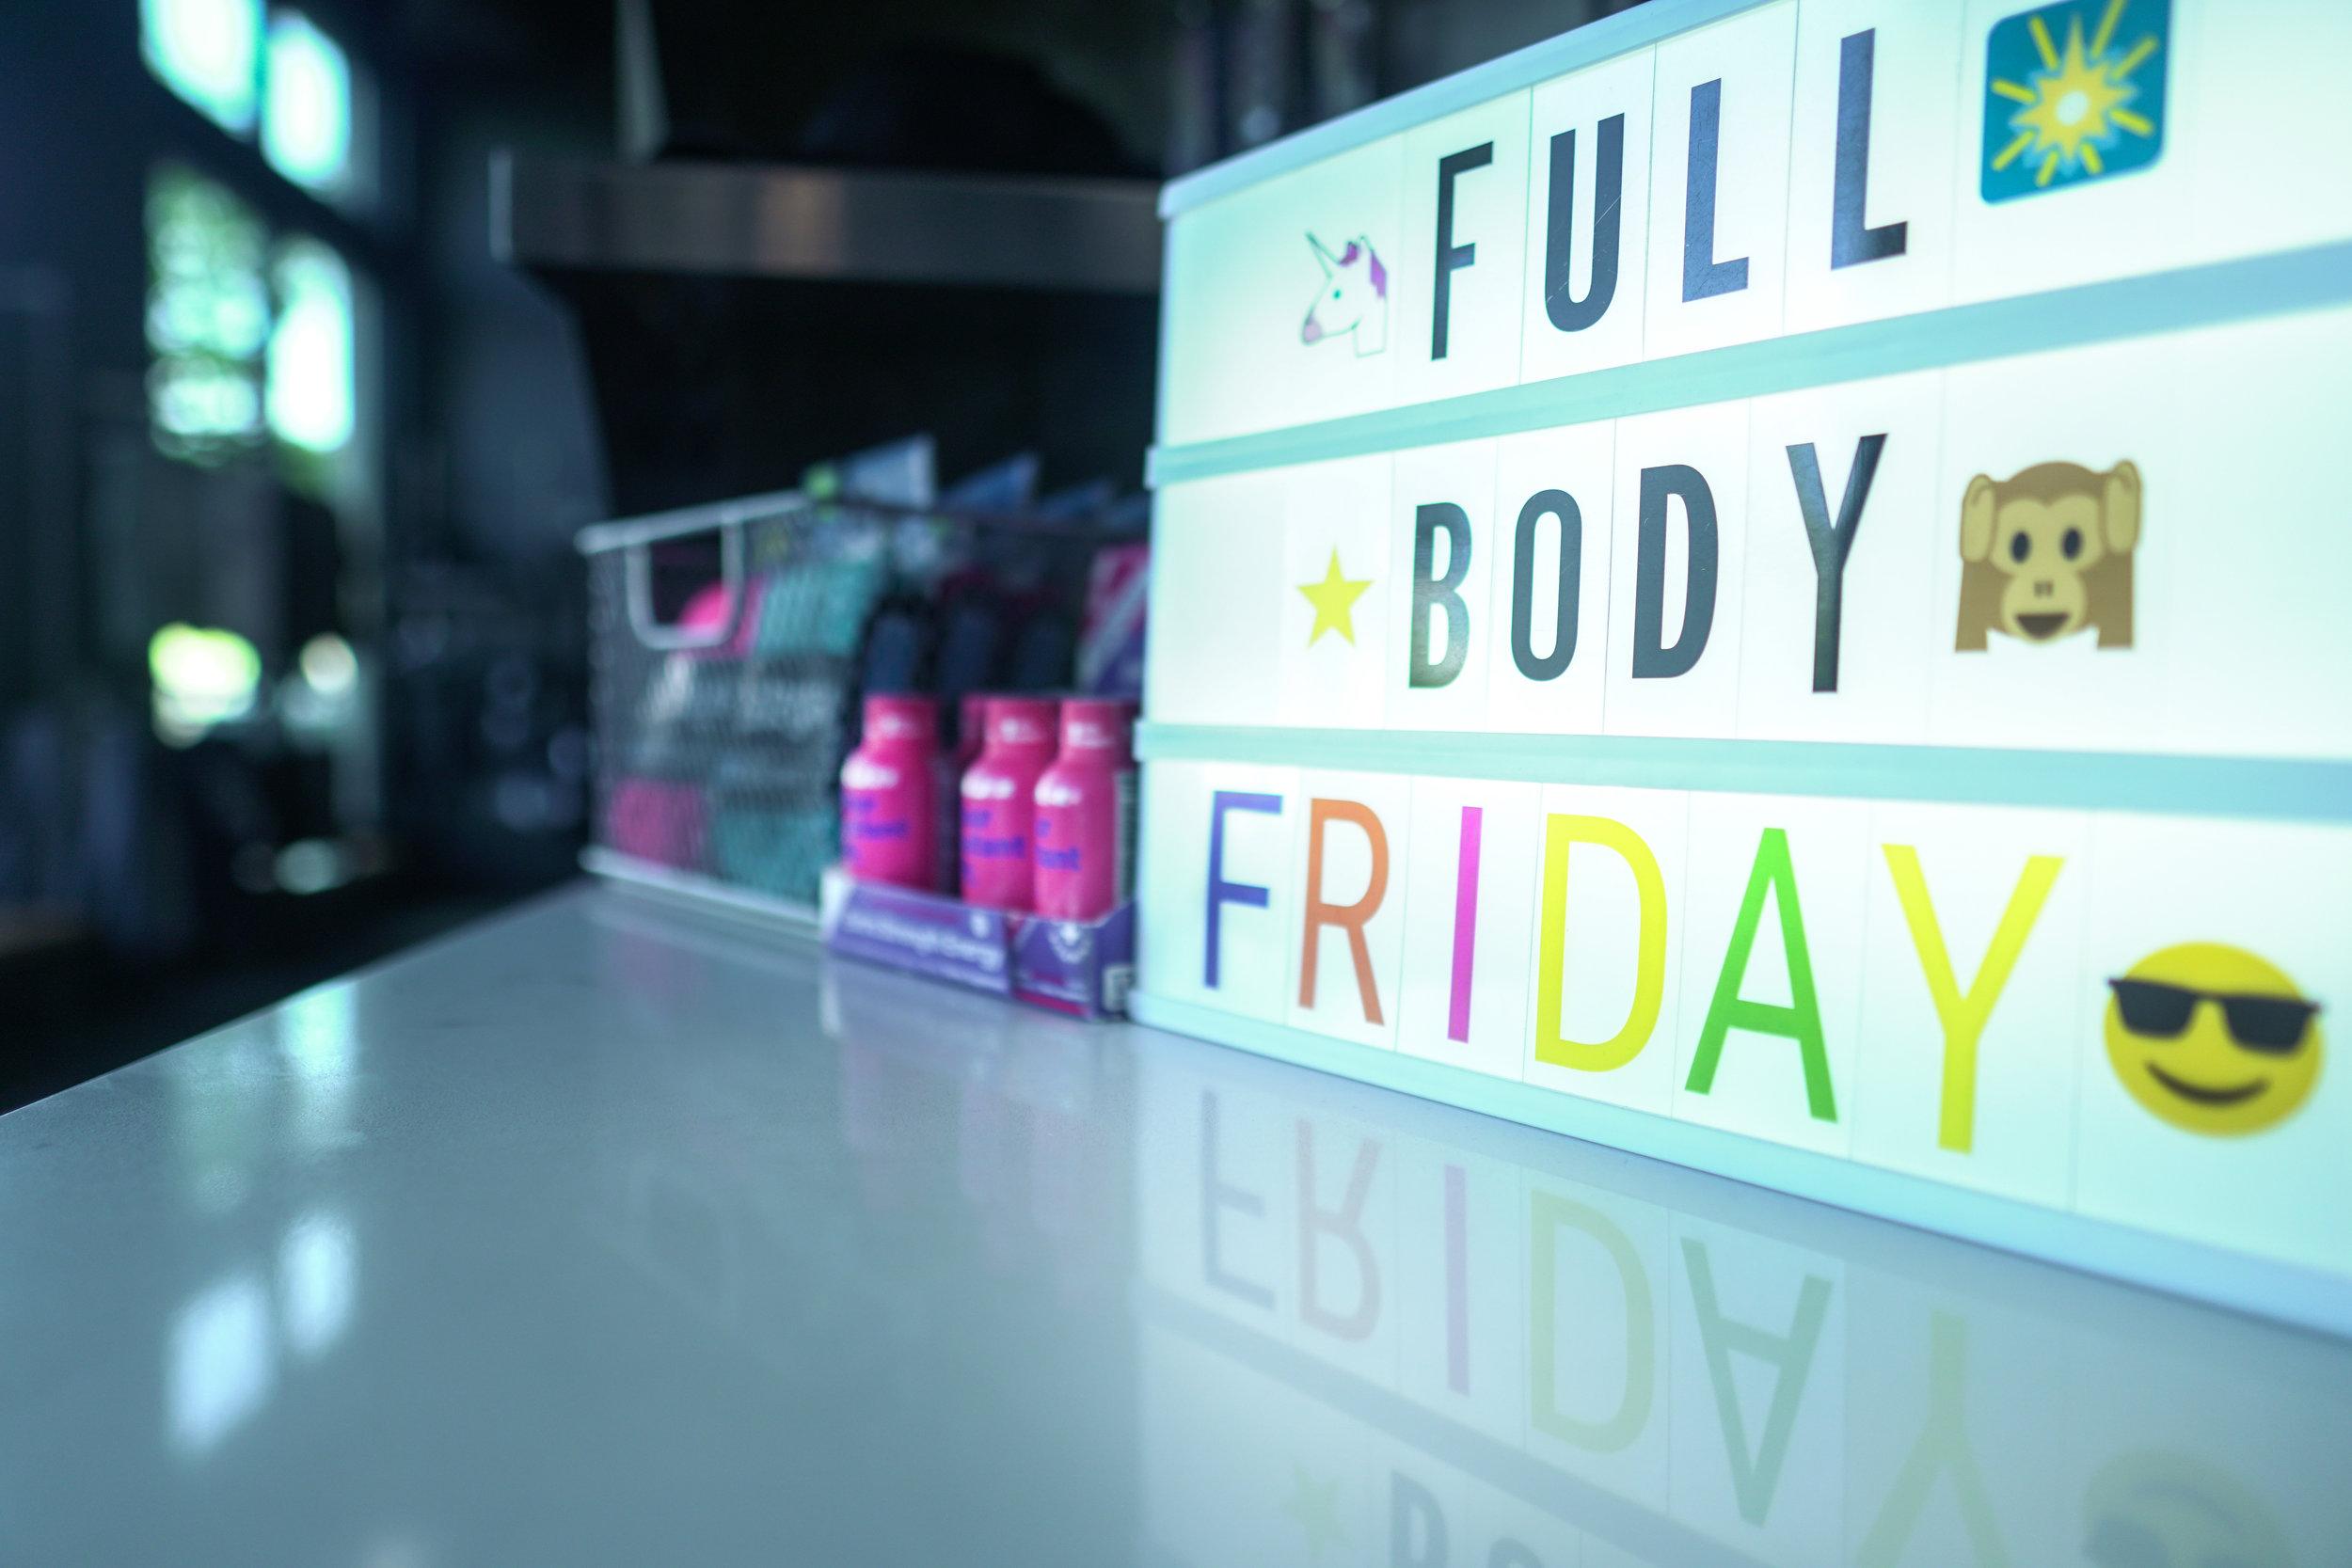 Full Body Friday